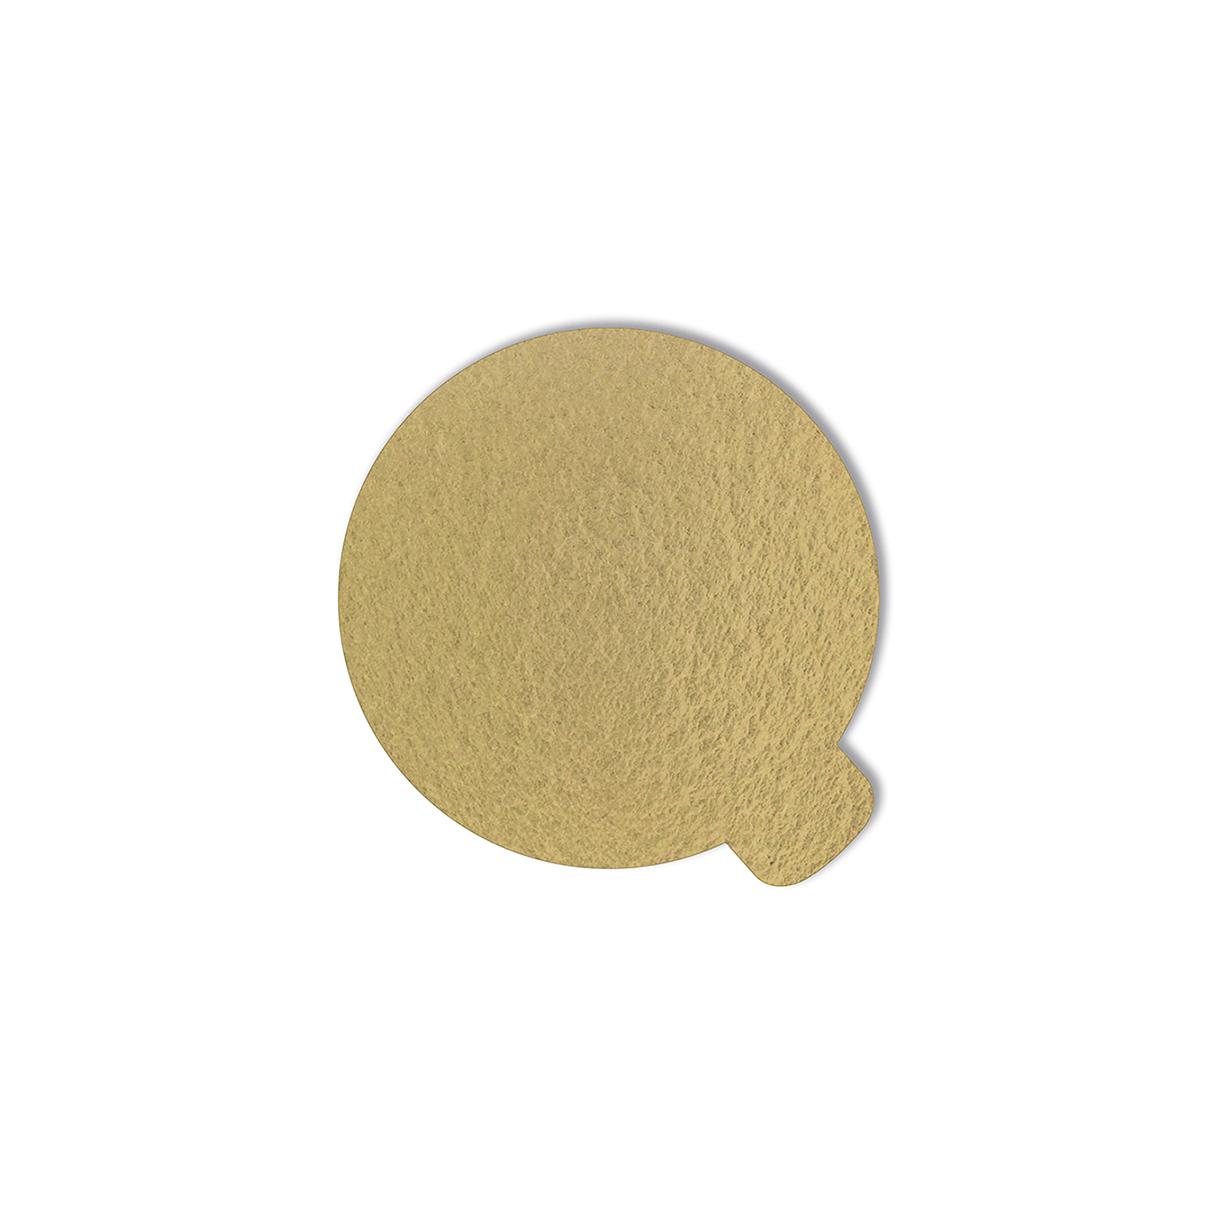 200 Bases Laminadas, Suporte P/ Doces 8cm - Ouro